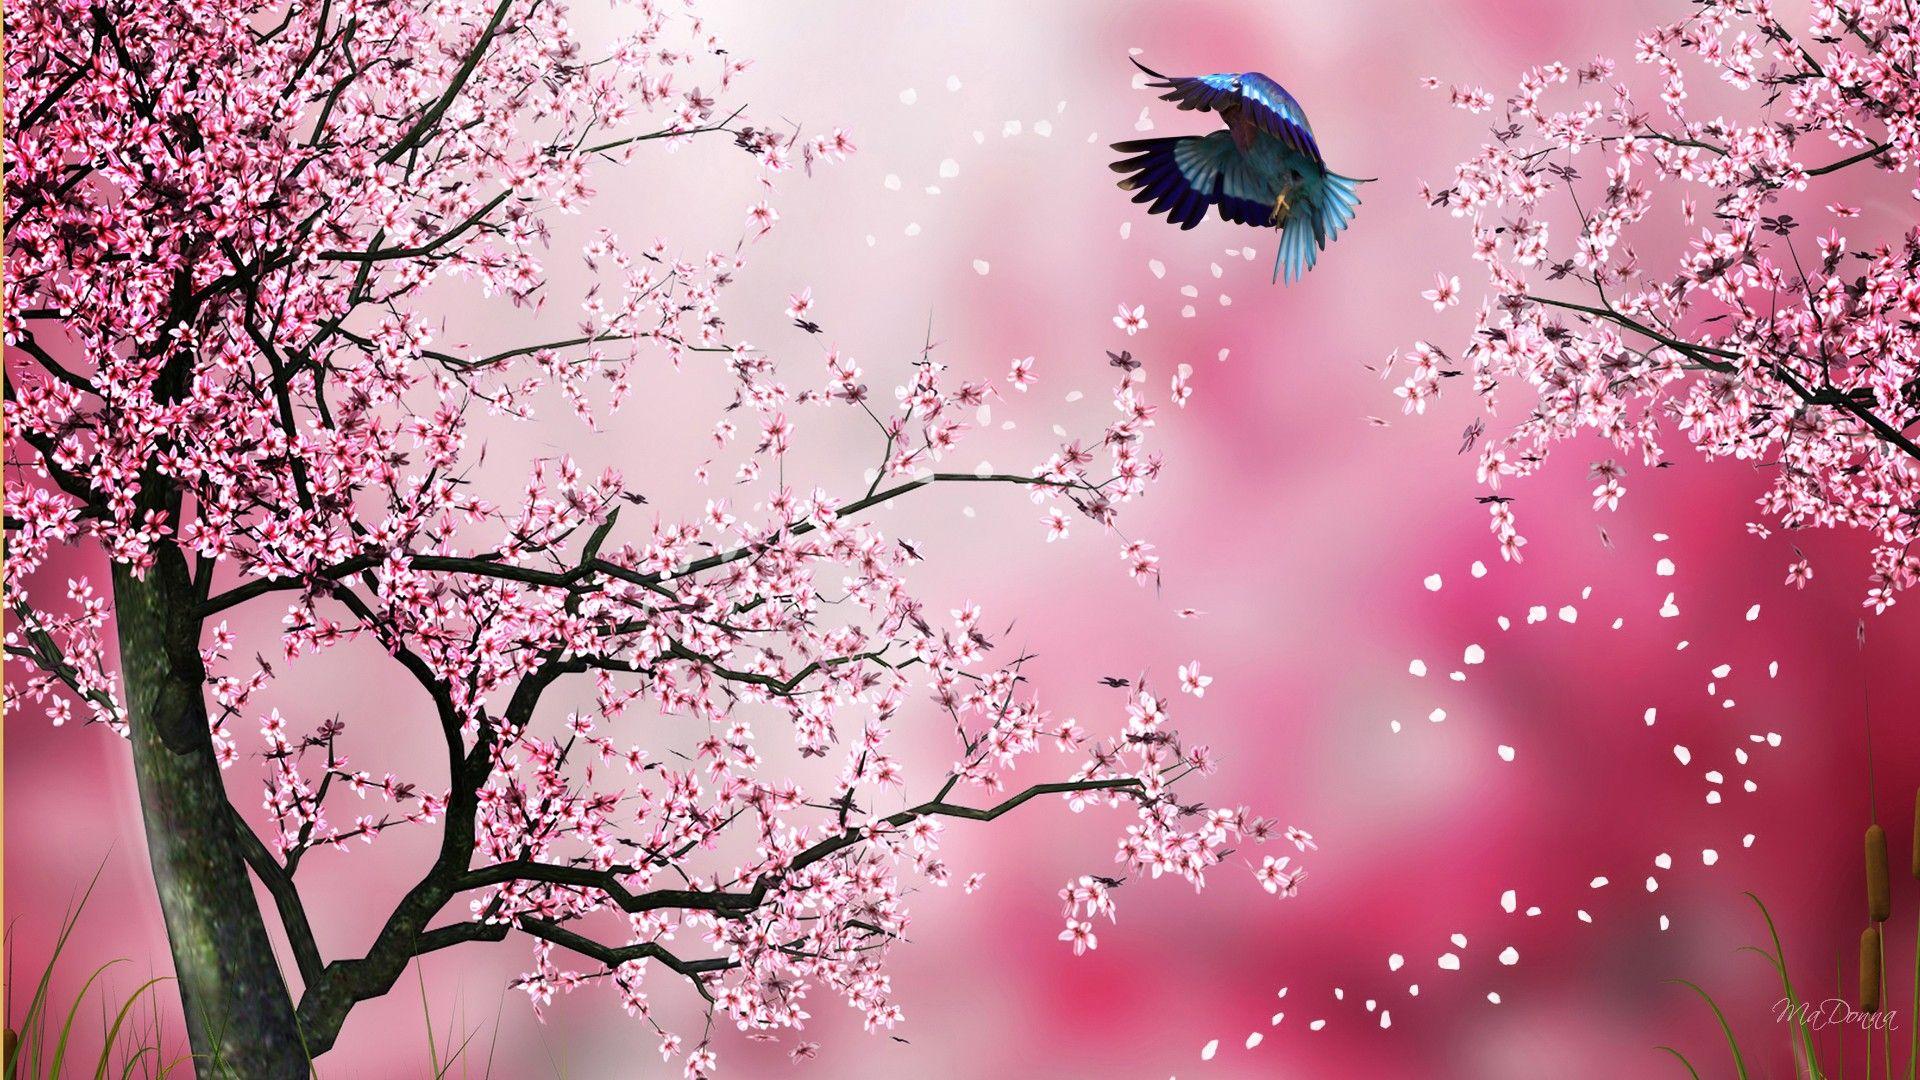 Sakura Pink Cherry Blossom Wallpaper Sakura Painting Tree Hd Wallpaper